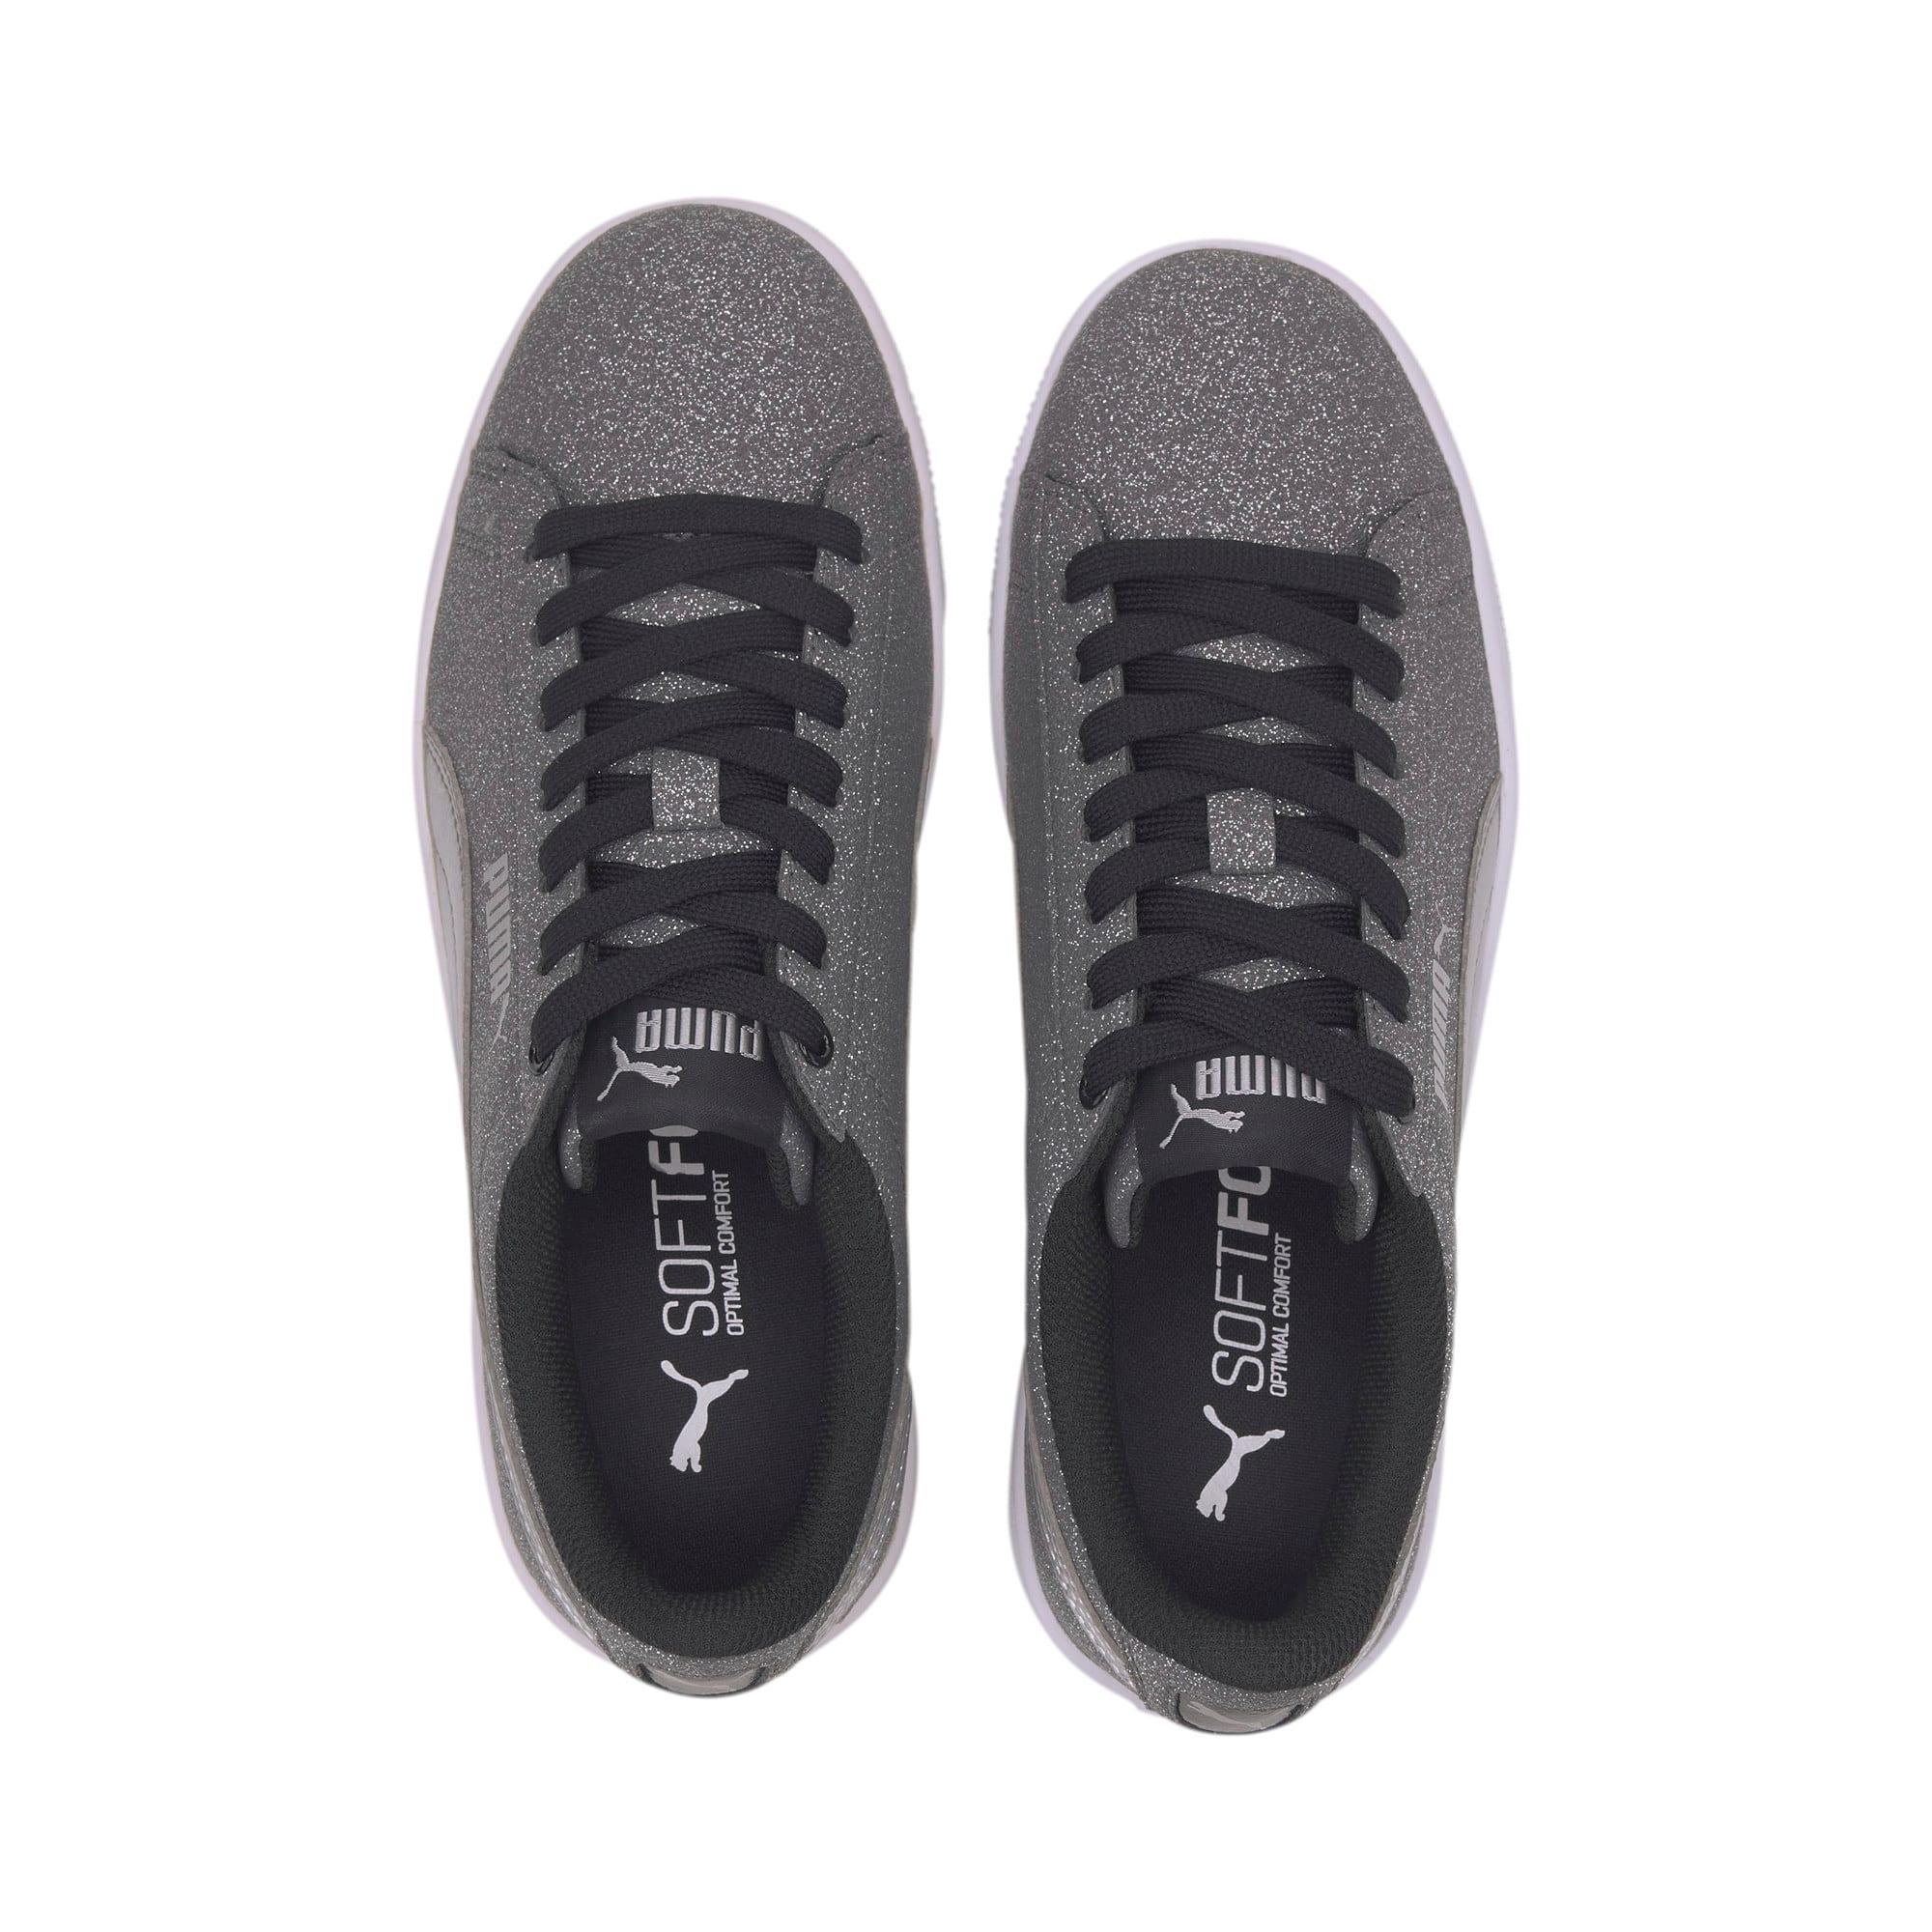 Thumbnail 6 of PUMA Vikky v2 Glitz Sneakers JR, Puma Black-Puma Silver-White, medium